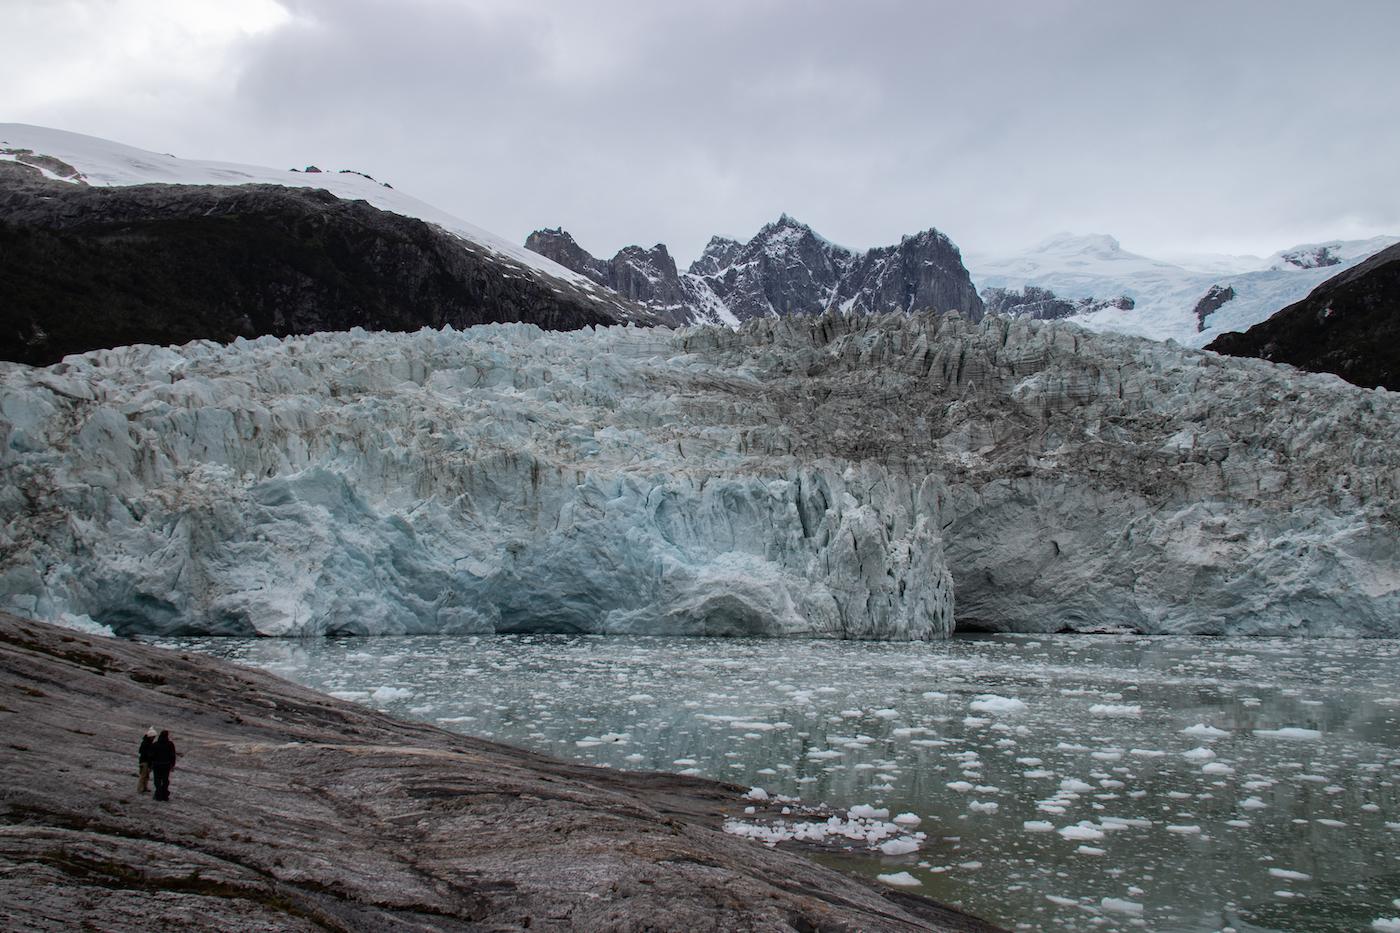 Patagonie cruise fjorden gletsjers